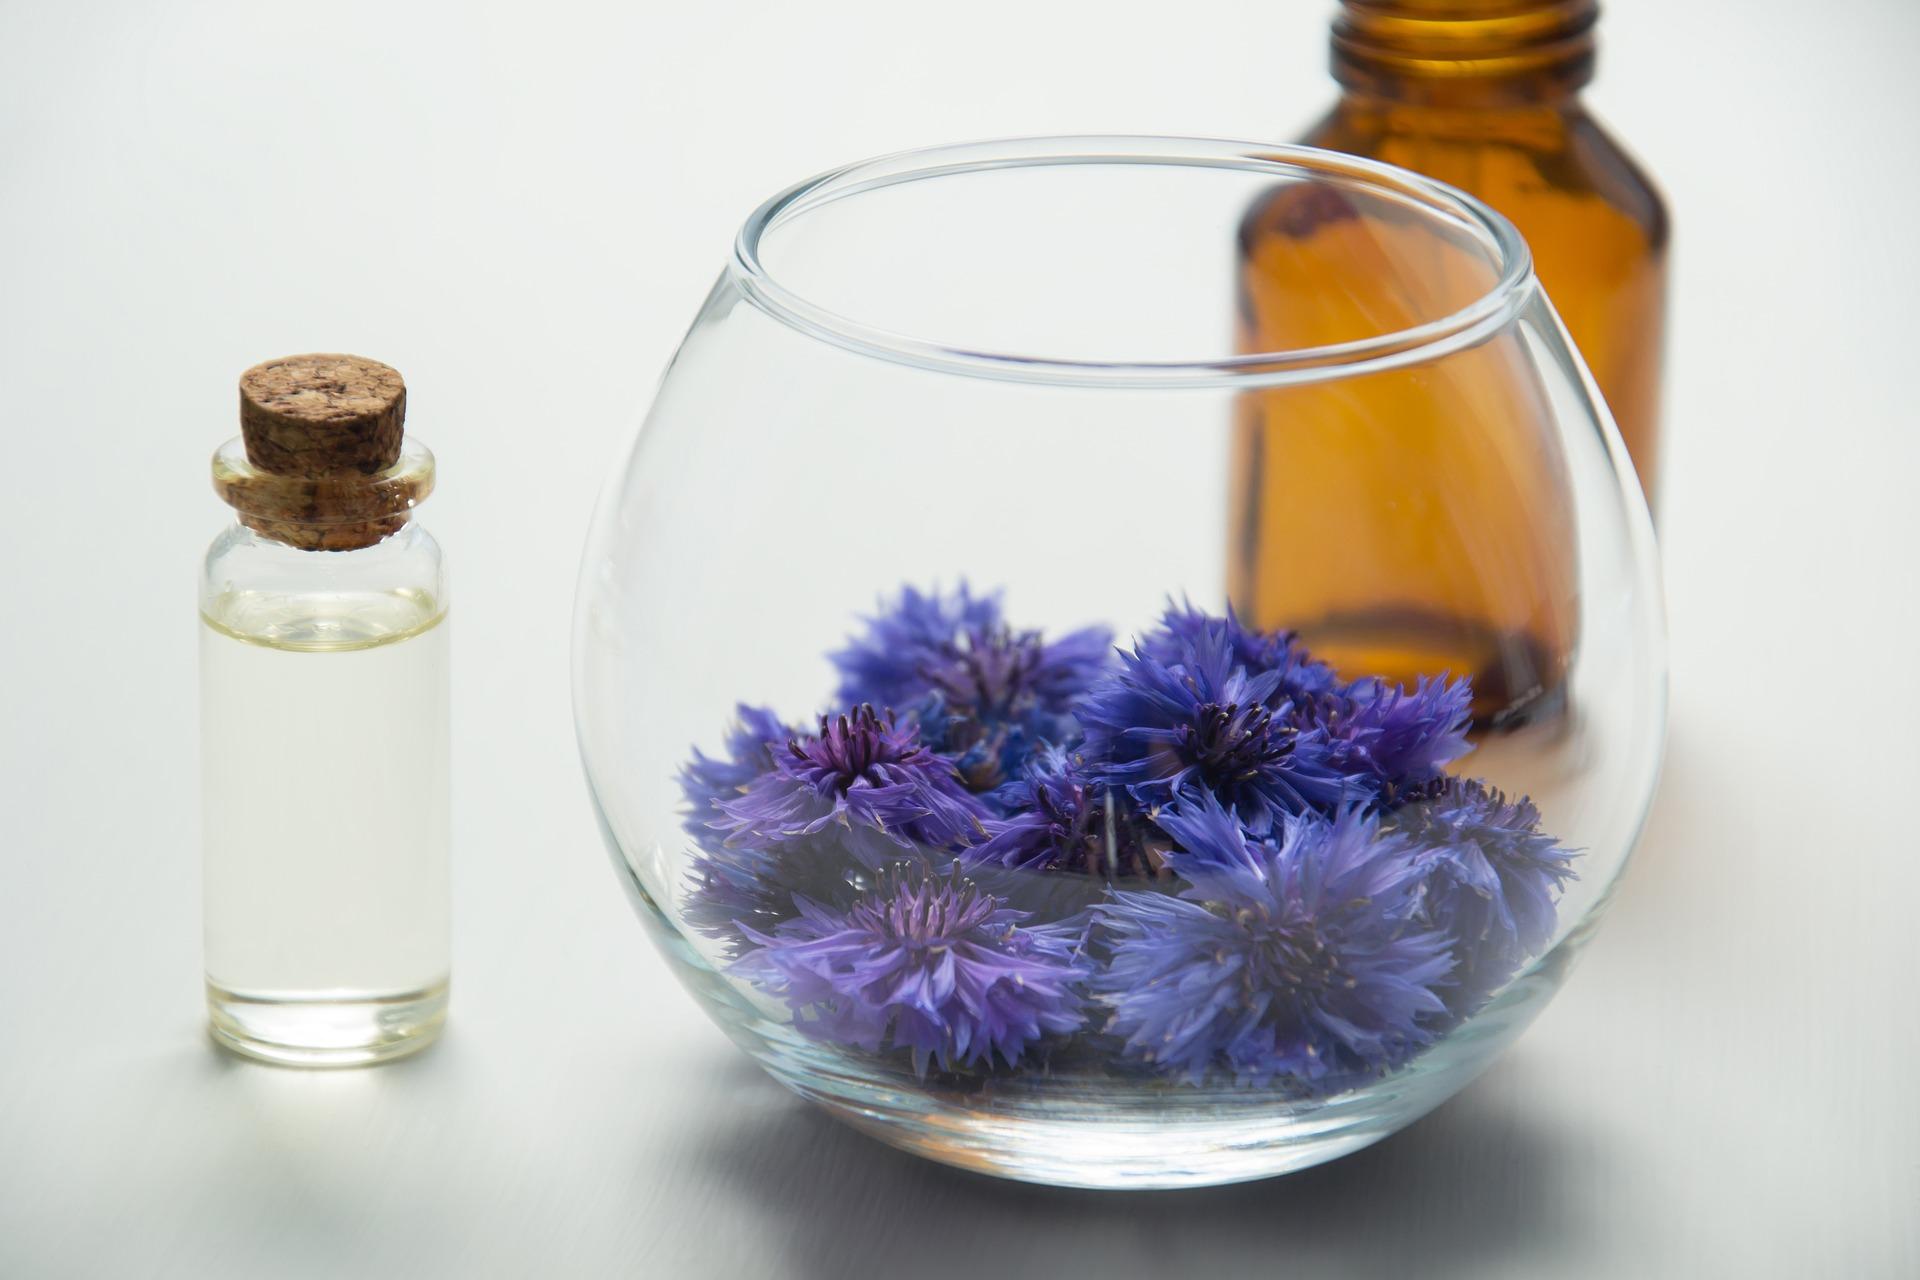 essential-oils-2654390_1920.jpg